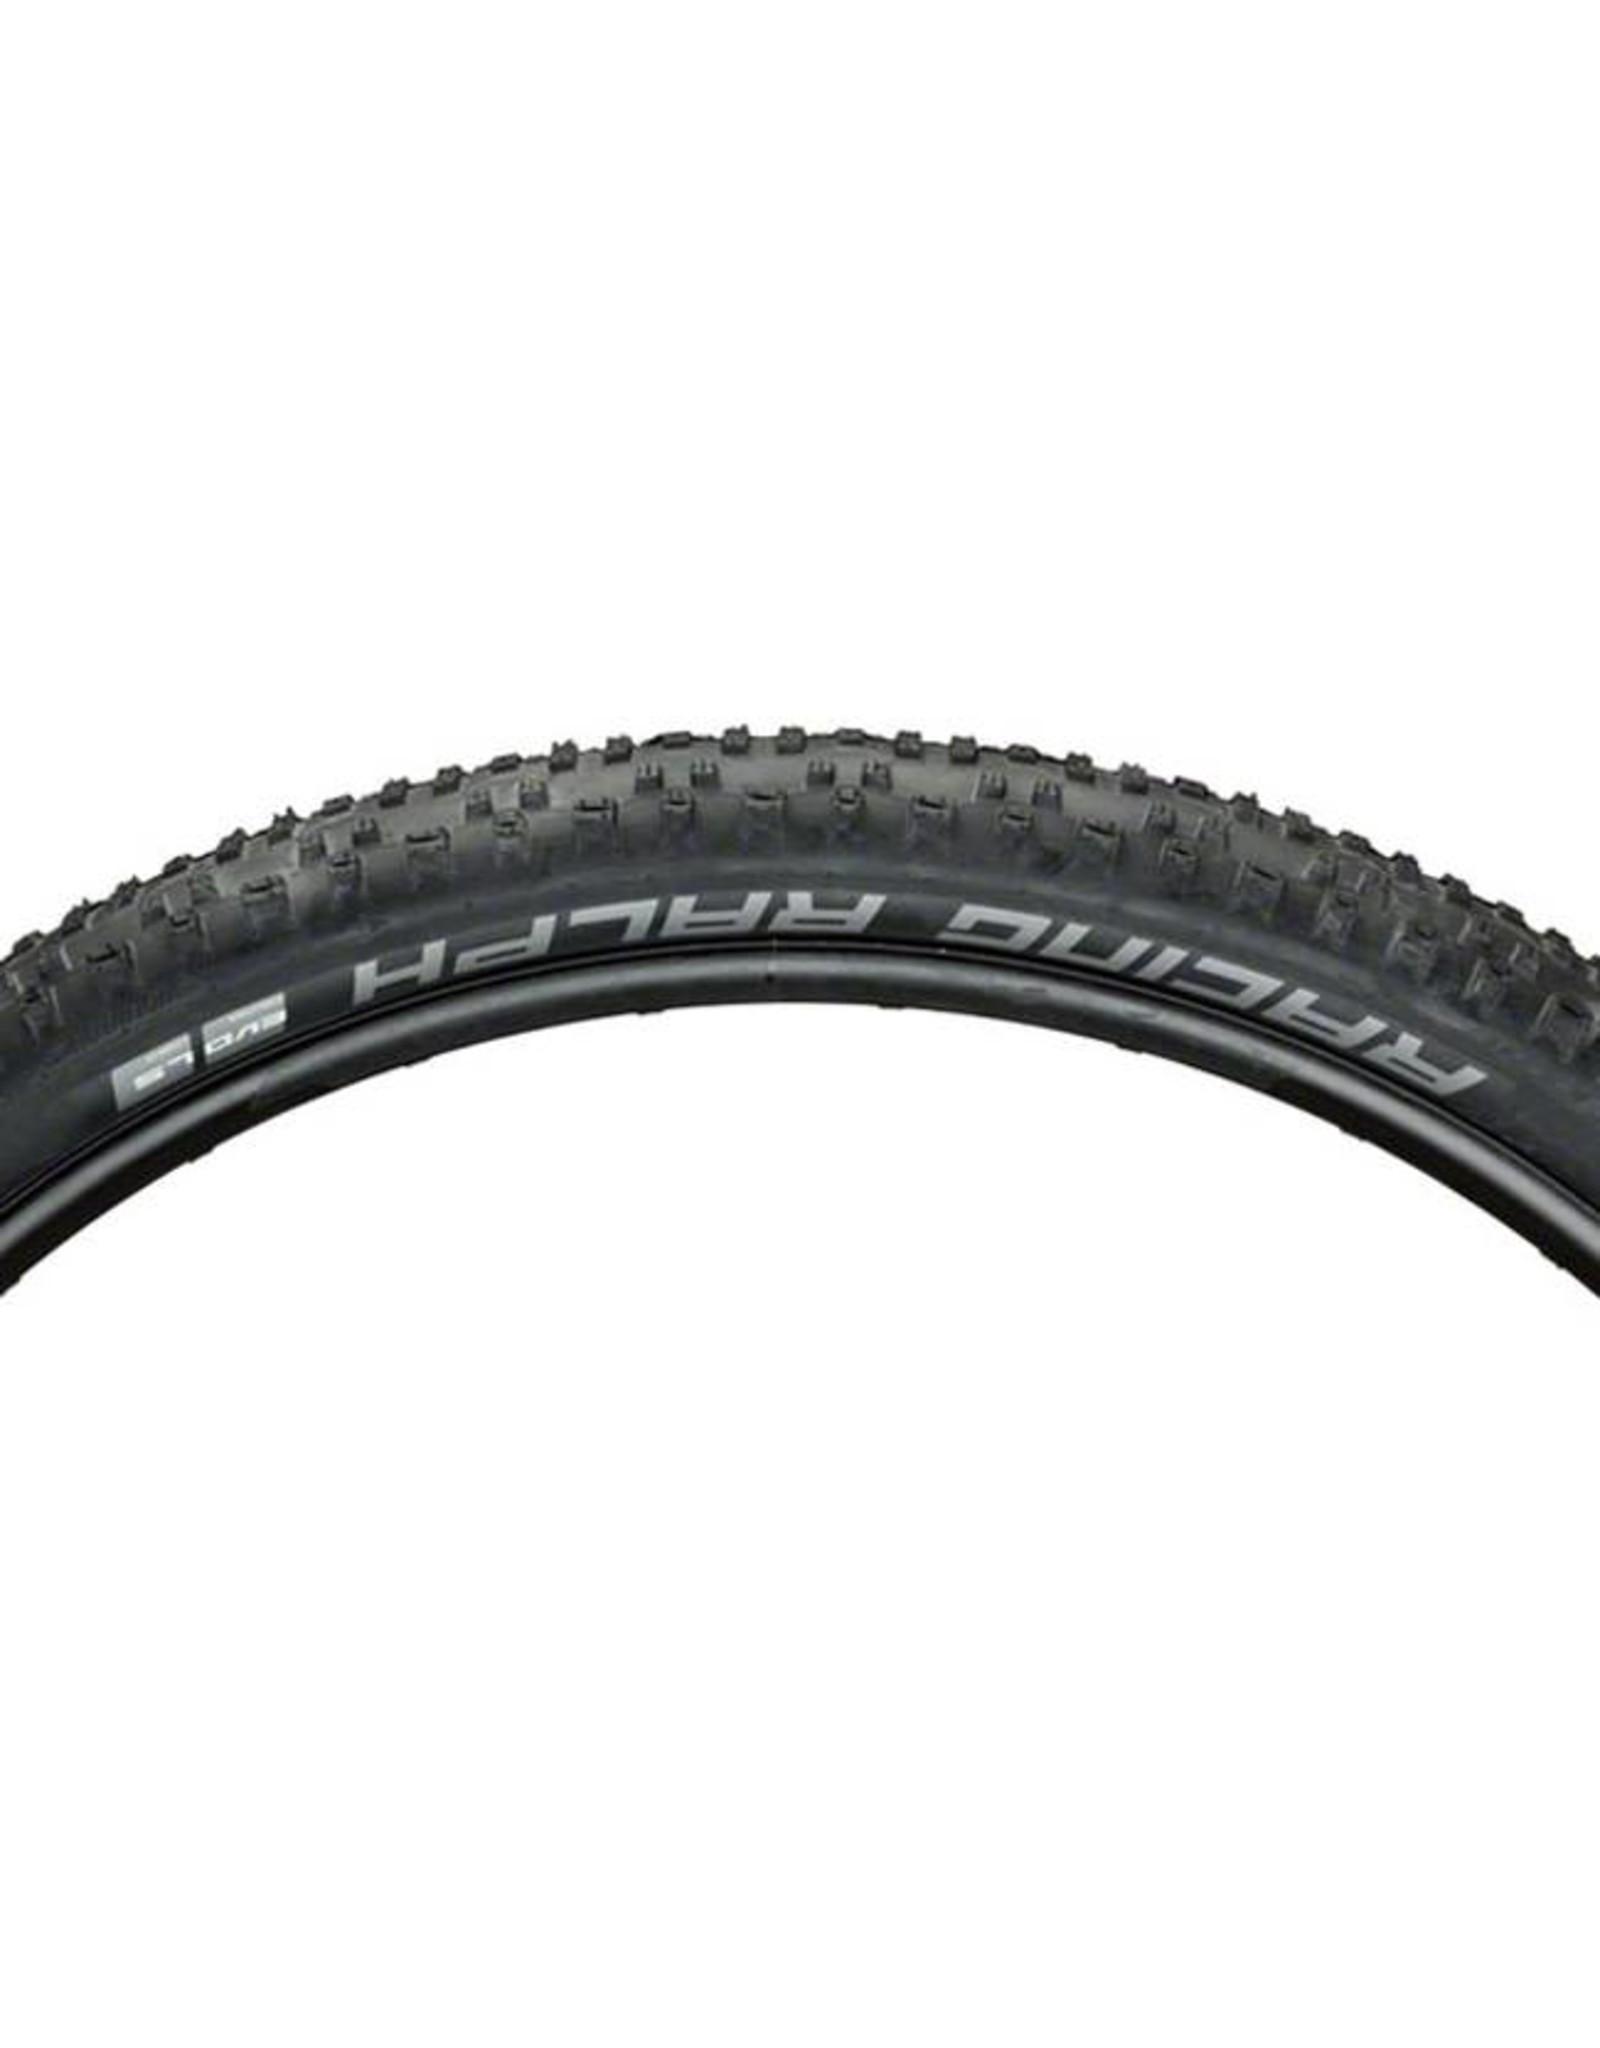 "Schwalbe Schwalbe Racing Ralph Tire: 29 x 2.25"", Folding Bead, Evolution Line, Addix Speed Compound, LiteSkin, Black"